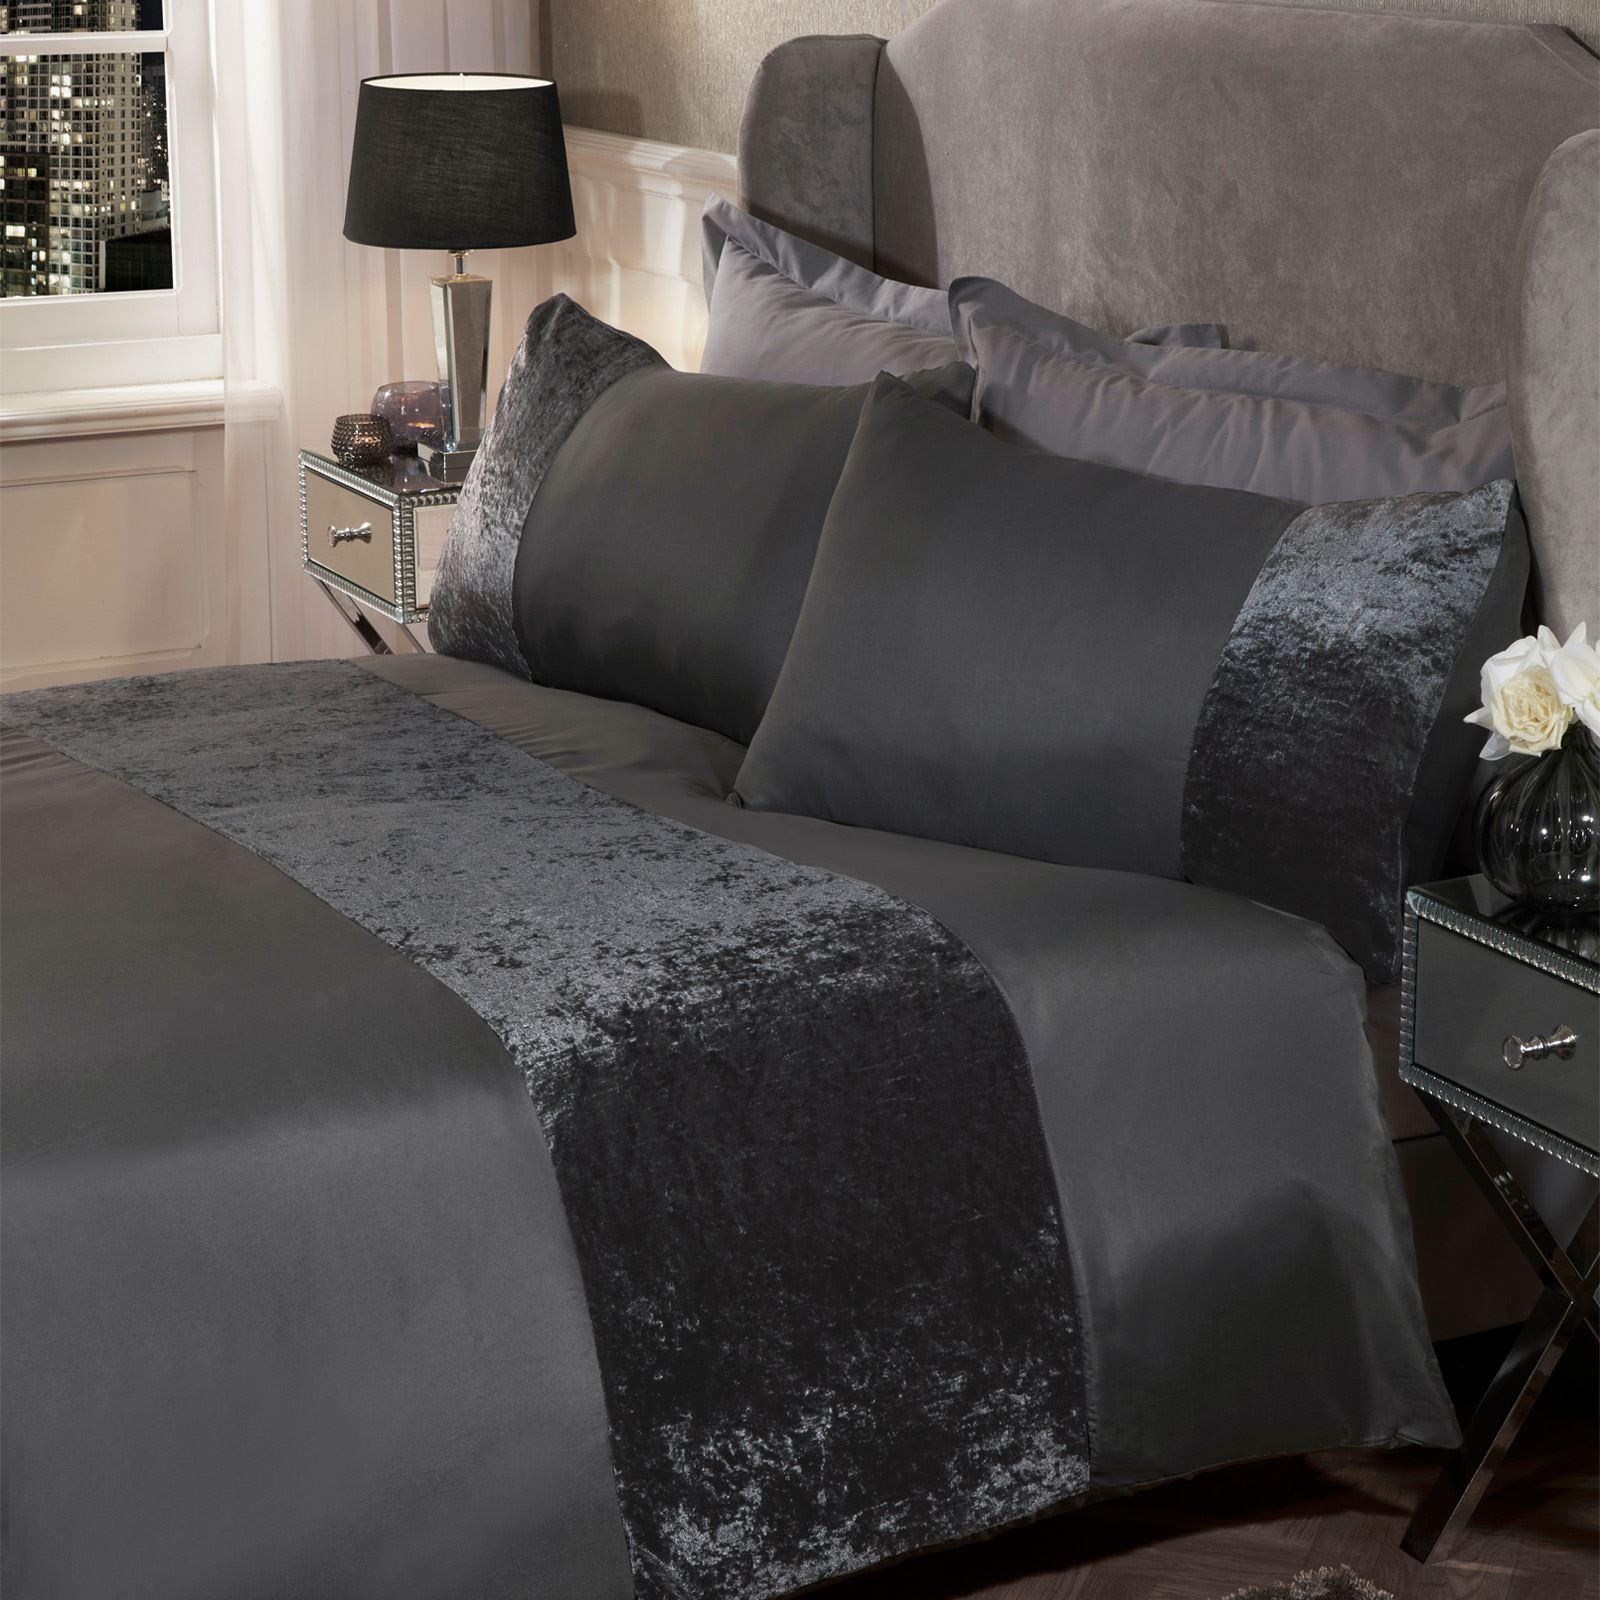 thumbnail 18 - Sienna Crushed Velvet Panel Duvet Cover with Pillow Case Bedding Set Silver Grey